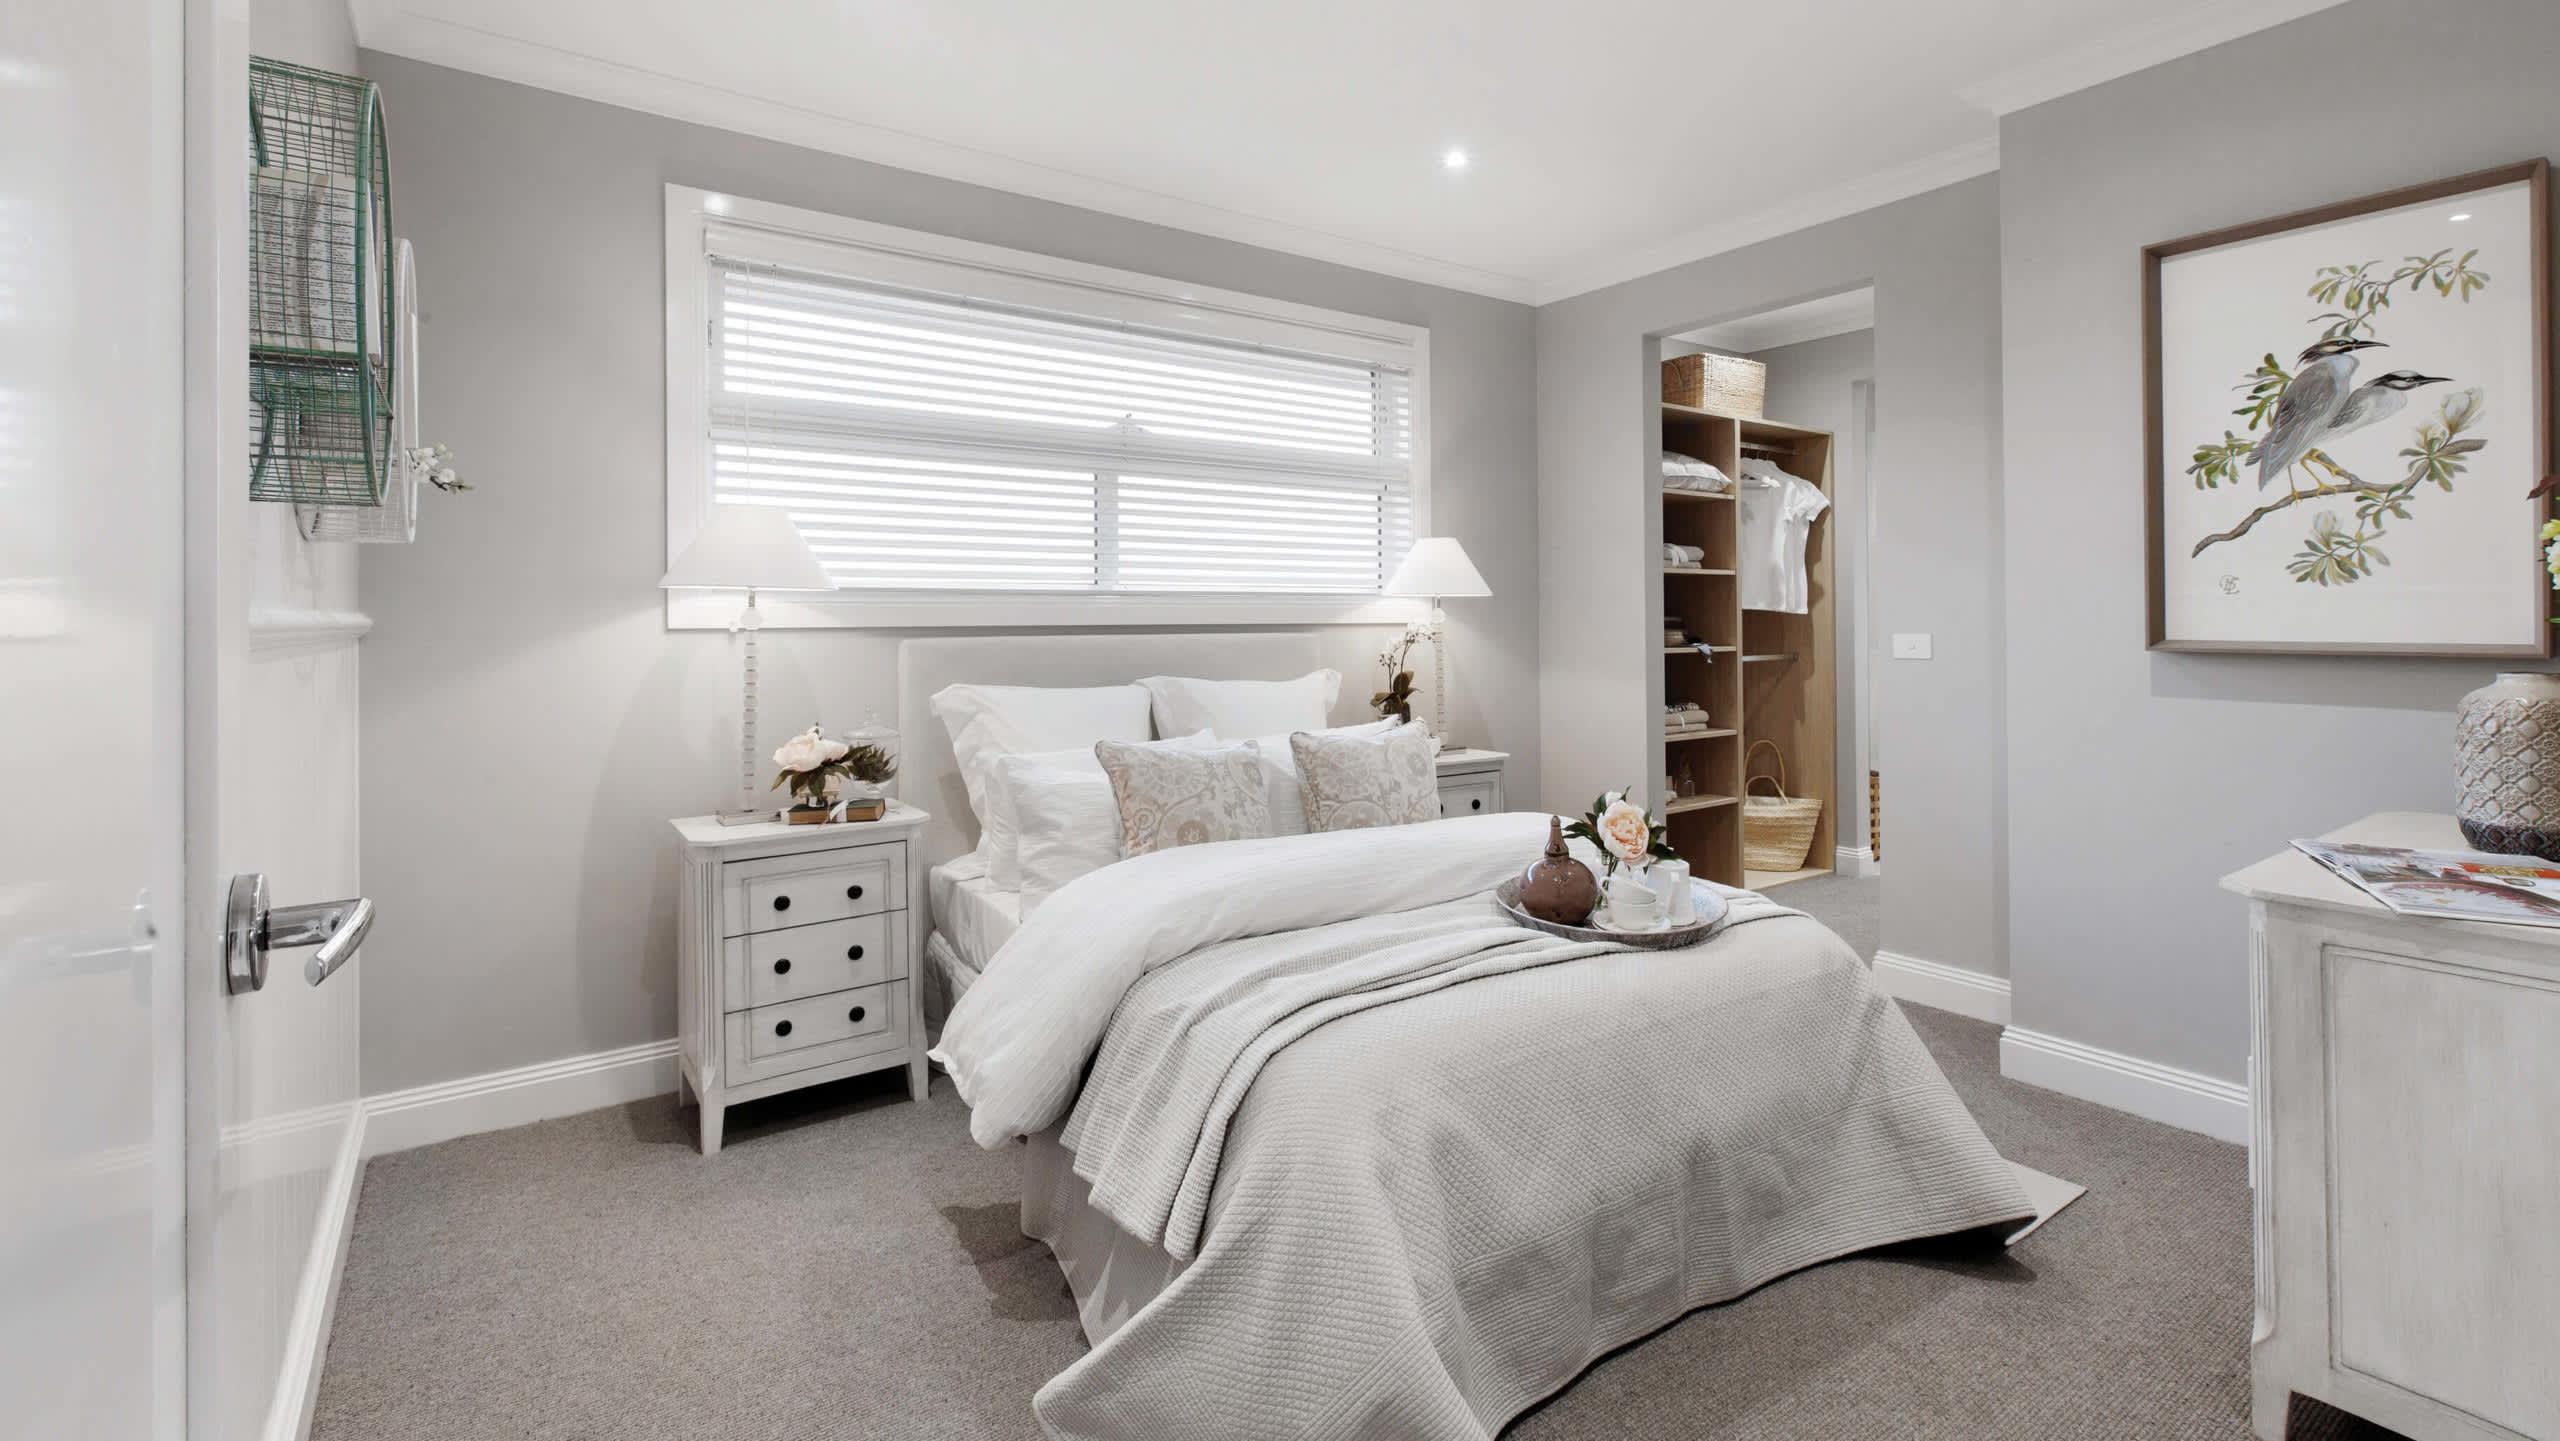 carousel image bedroom-1720_brookwater_51b_brighton_classic_hamptons6-1